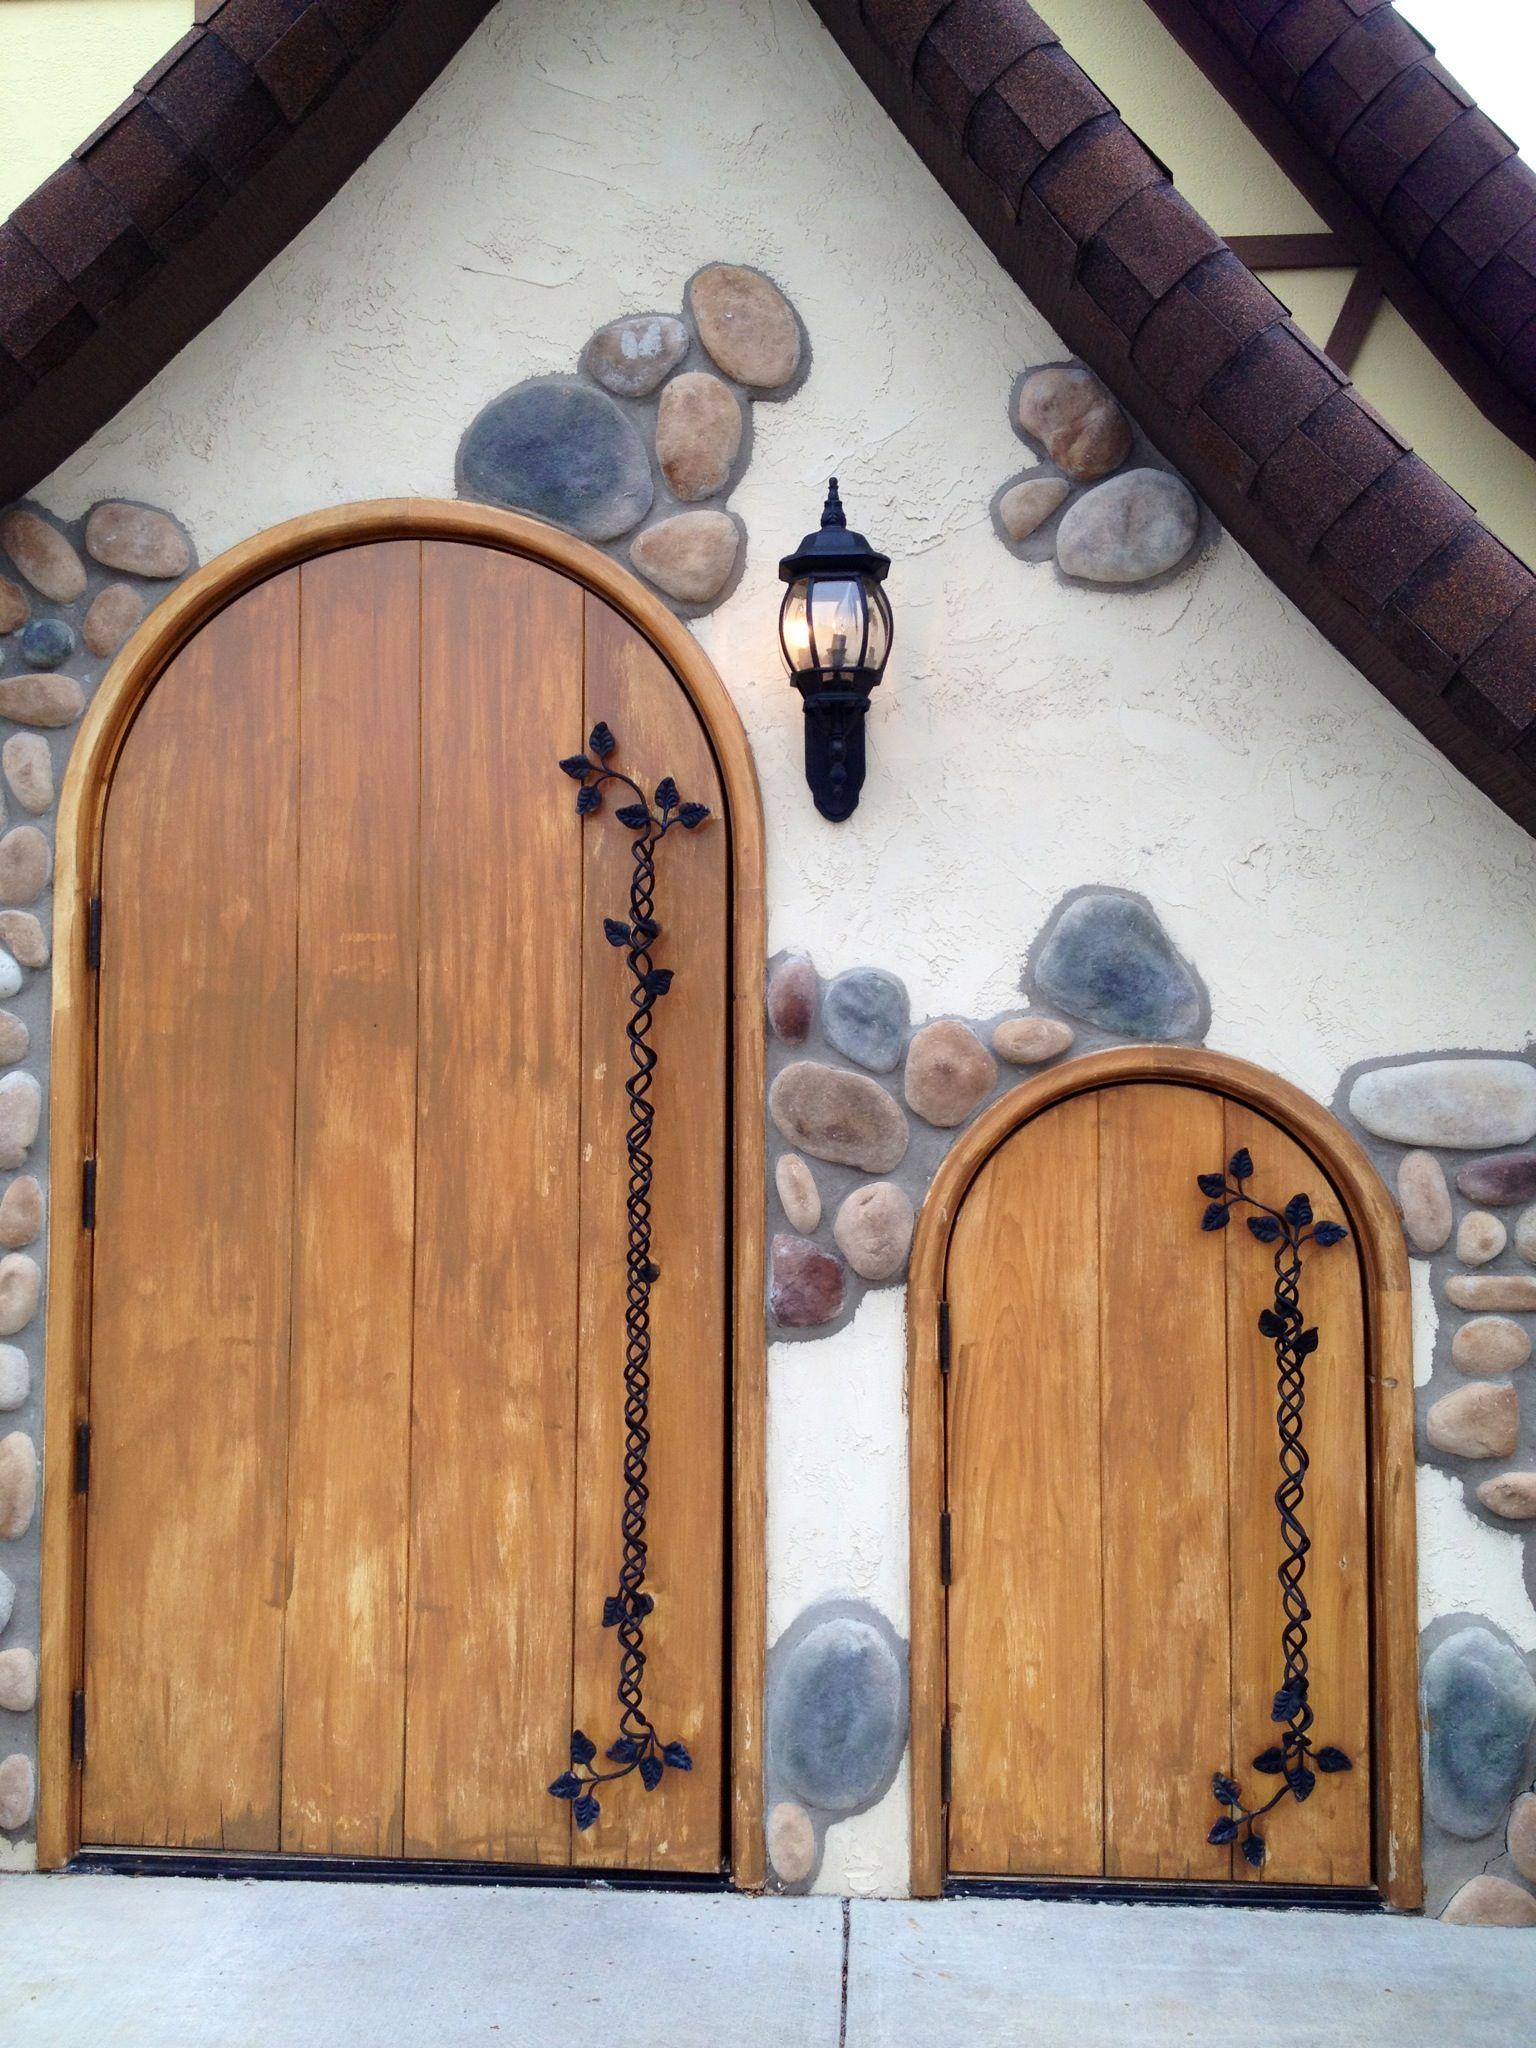 Dwarf door. Snow white. Child size. Small. Stone. Wood